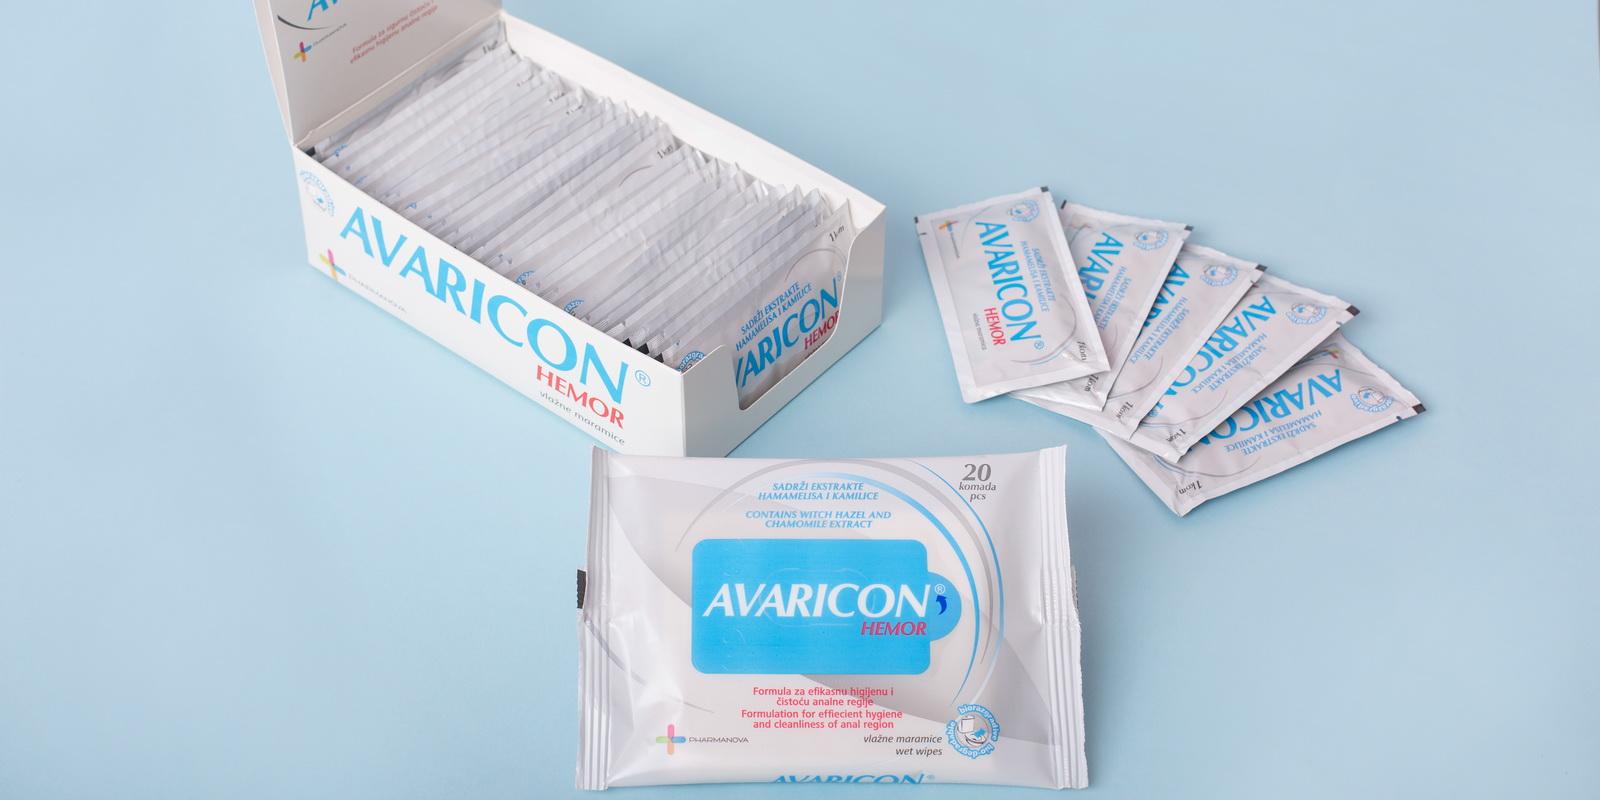 Avaricon-Hemor-profilna-1-2